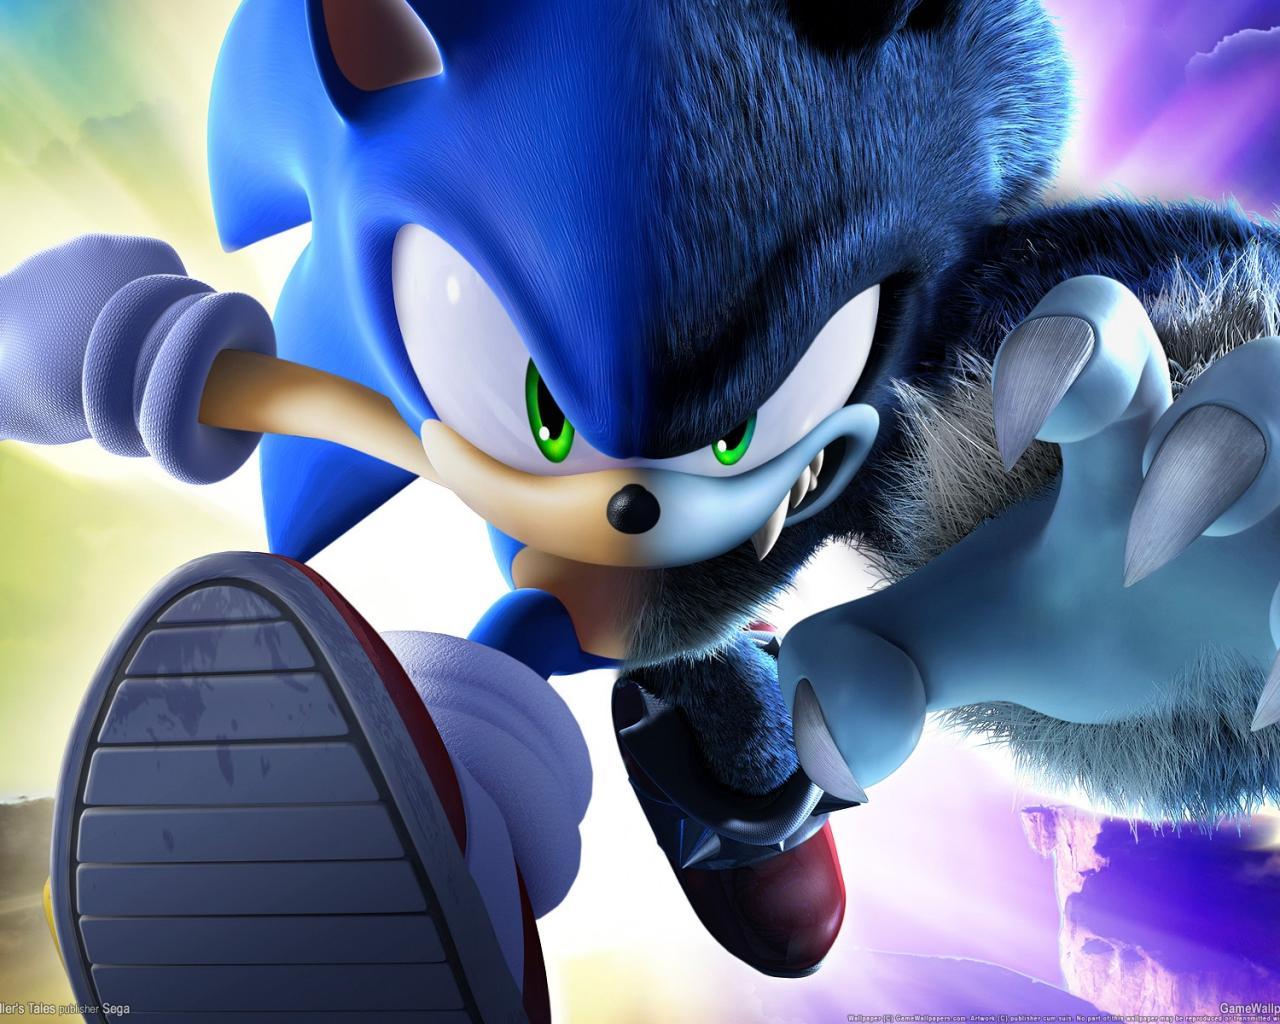 Обои игры игра Games Pubg Playerunknowns картинки на: Sonic Unleashed, Game, Pc Games, игра, видео игры